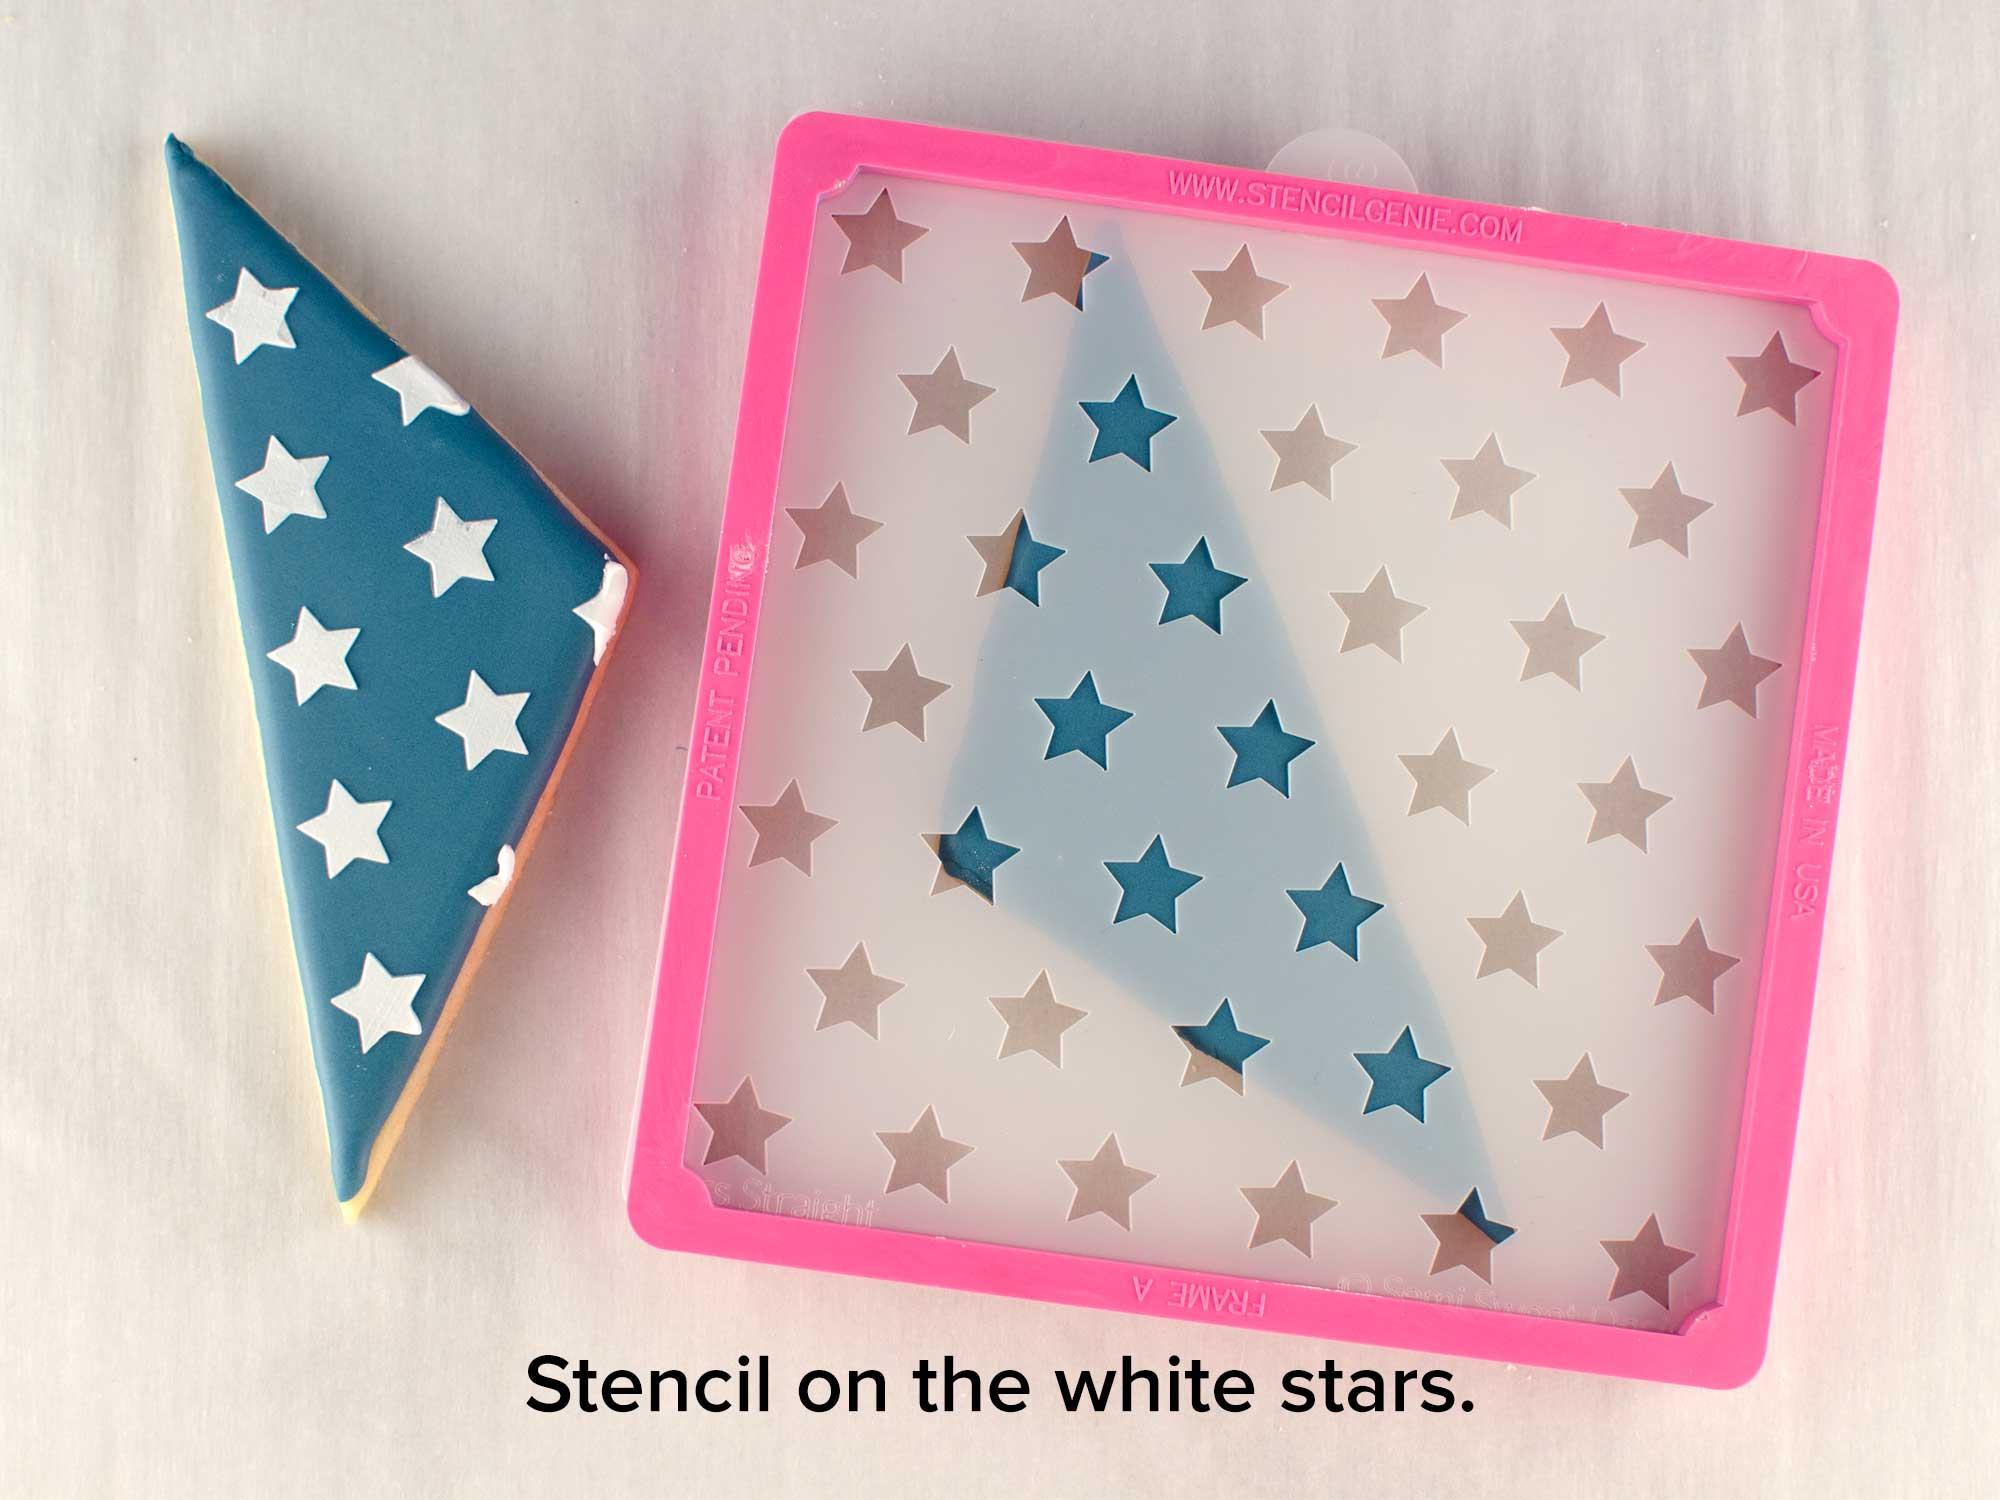 stencils white stars into cookies